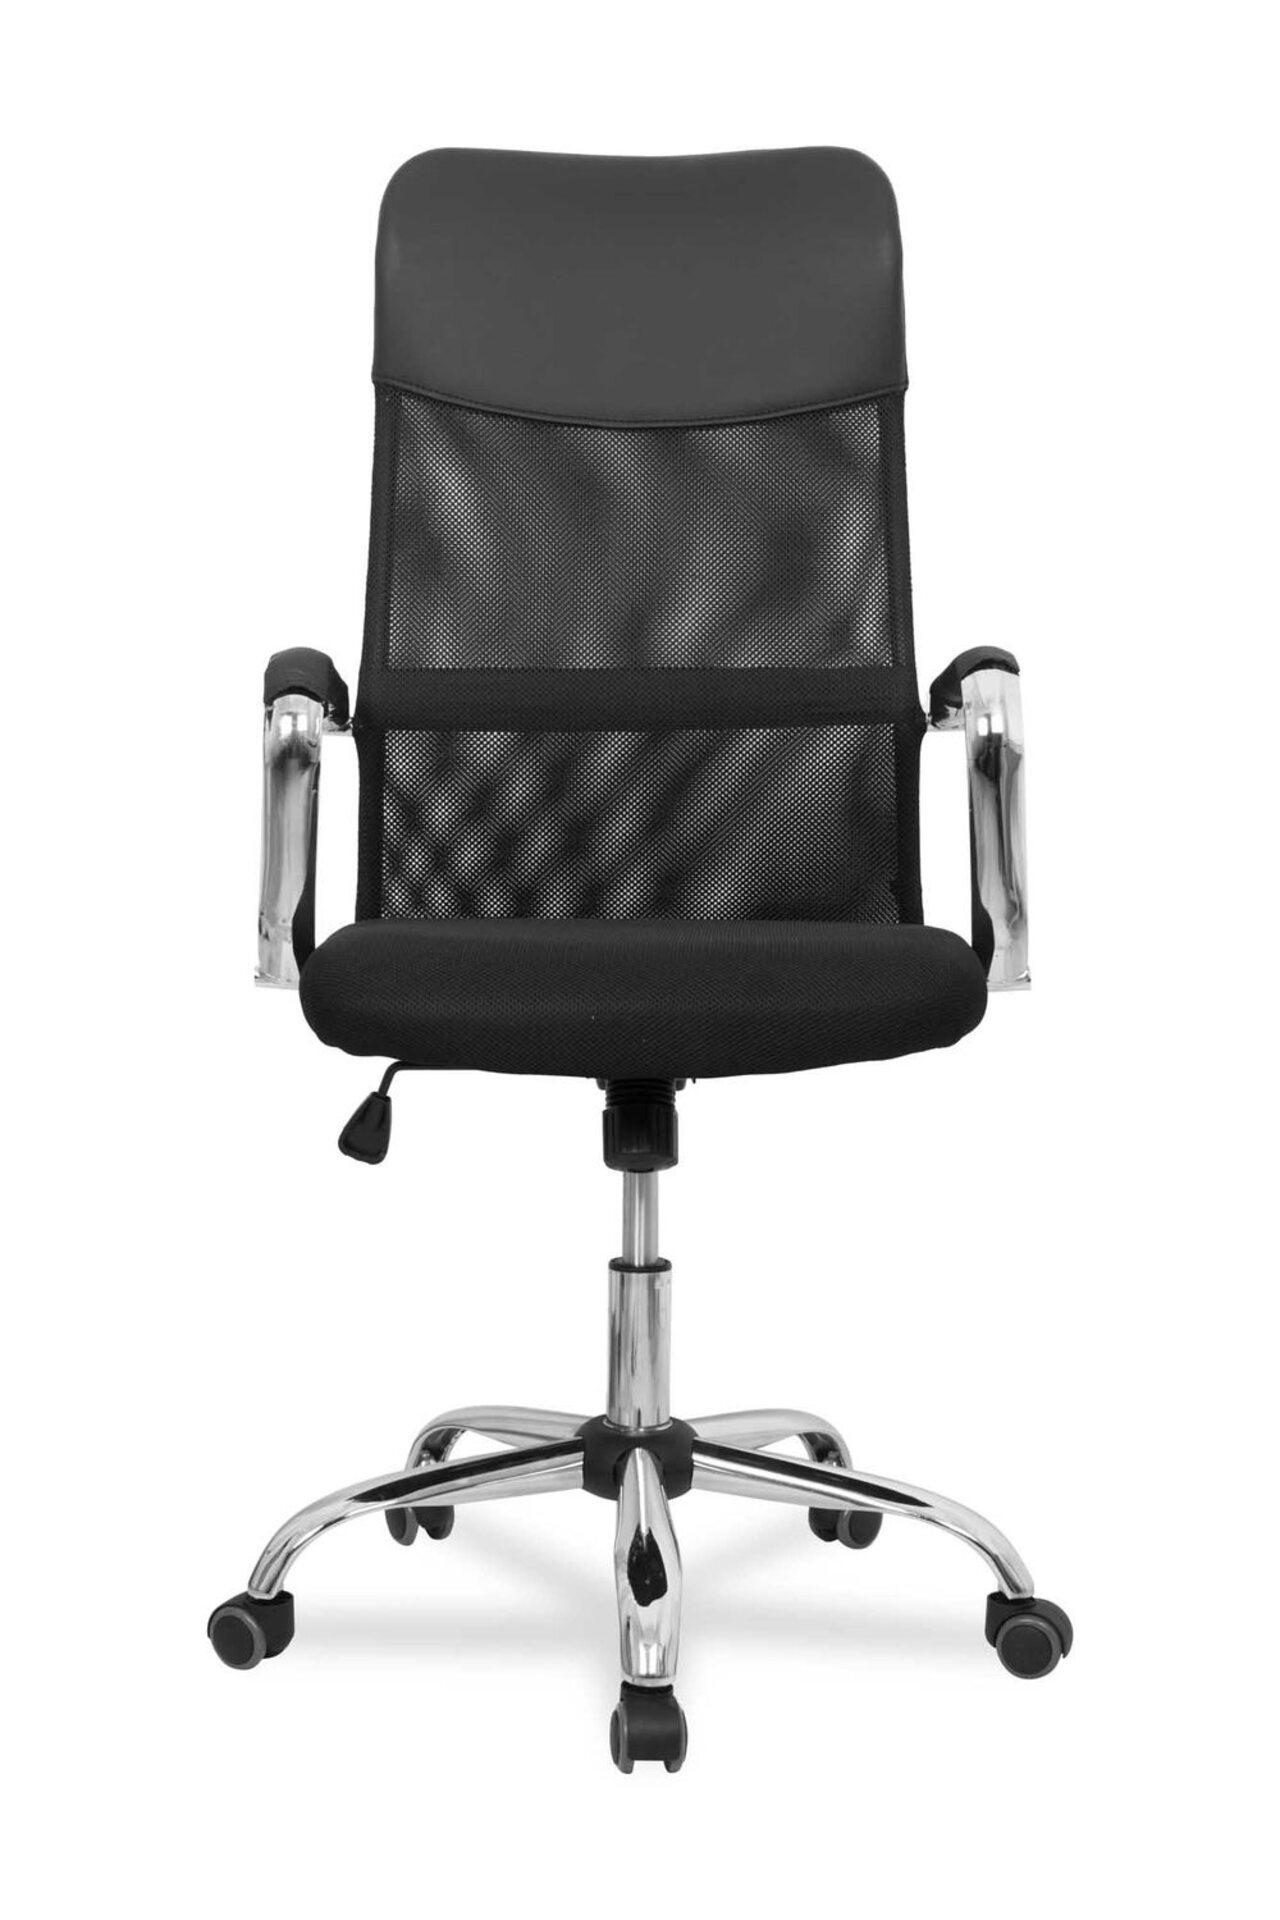 Кресло руководителя College CLG-419 MХН - фото 6